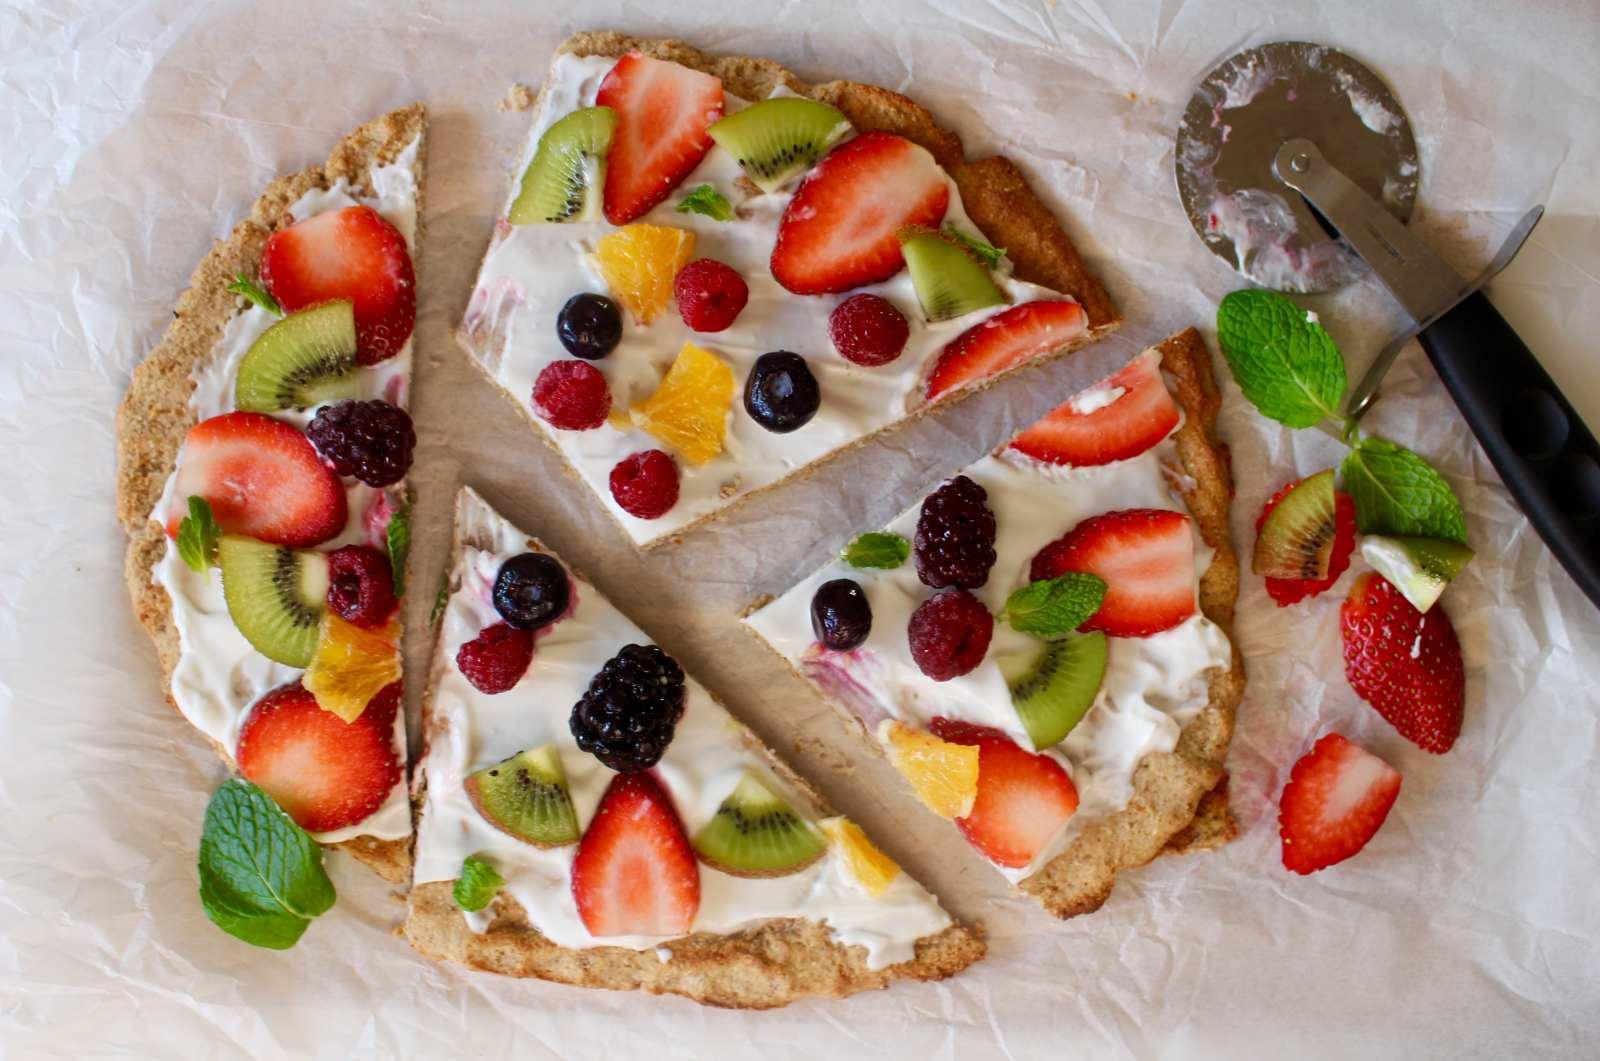 Fruit Breakfast Recipes  Healthy Fruit Pizza Recipe For Breakfast by Archana s Kitchen